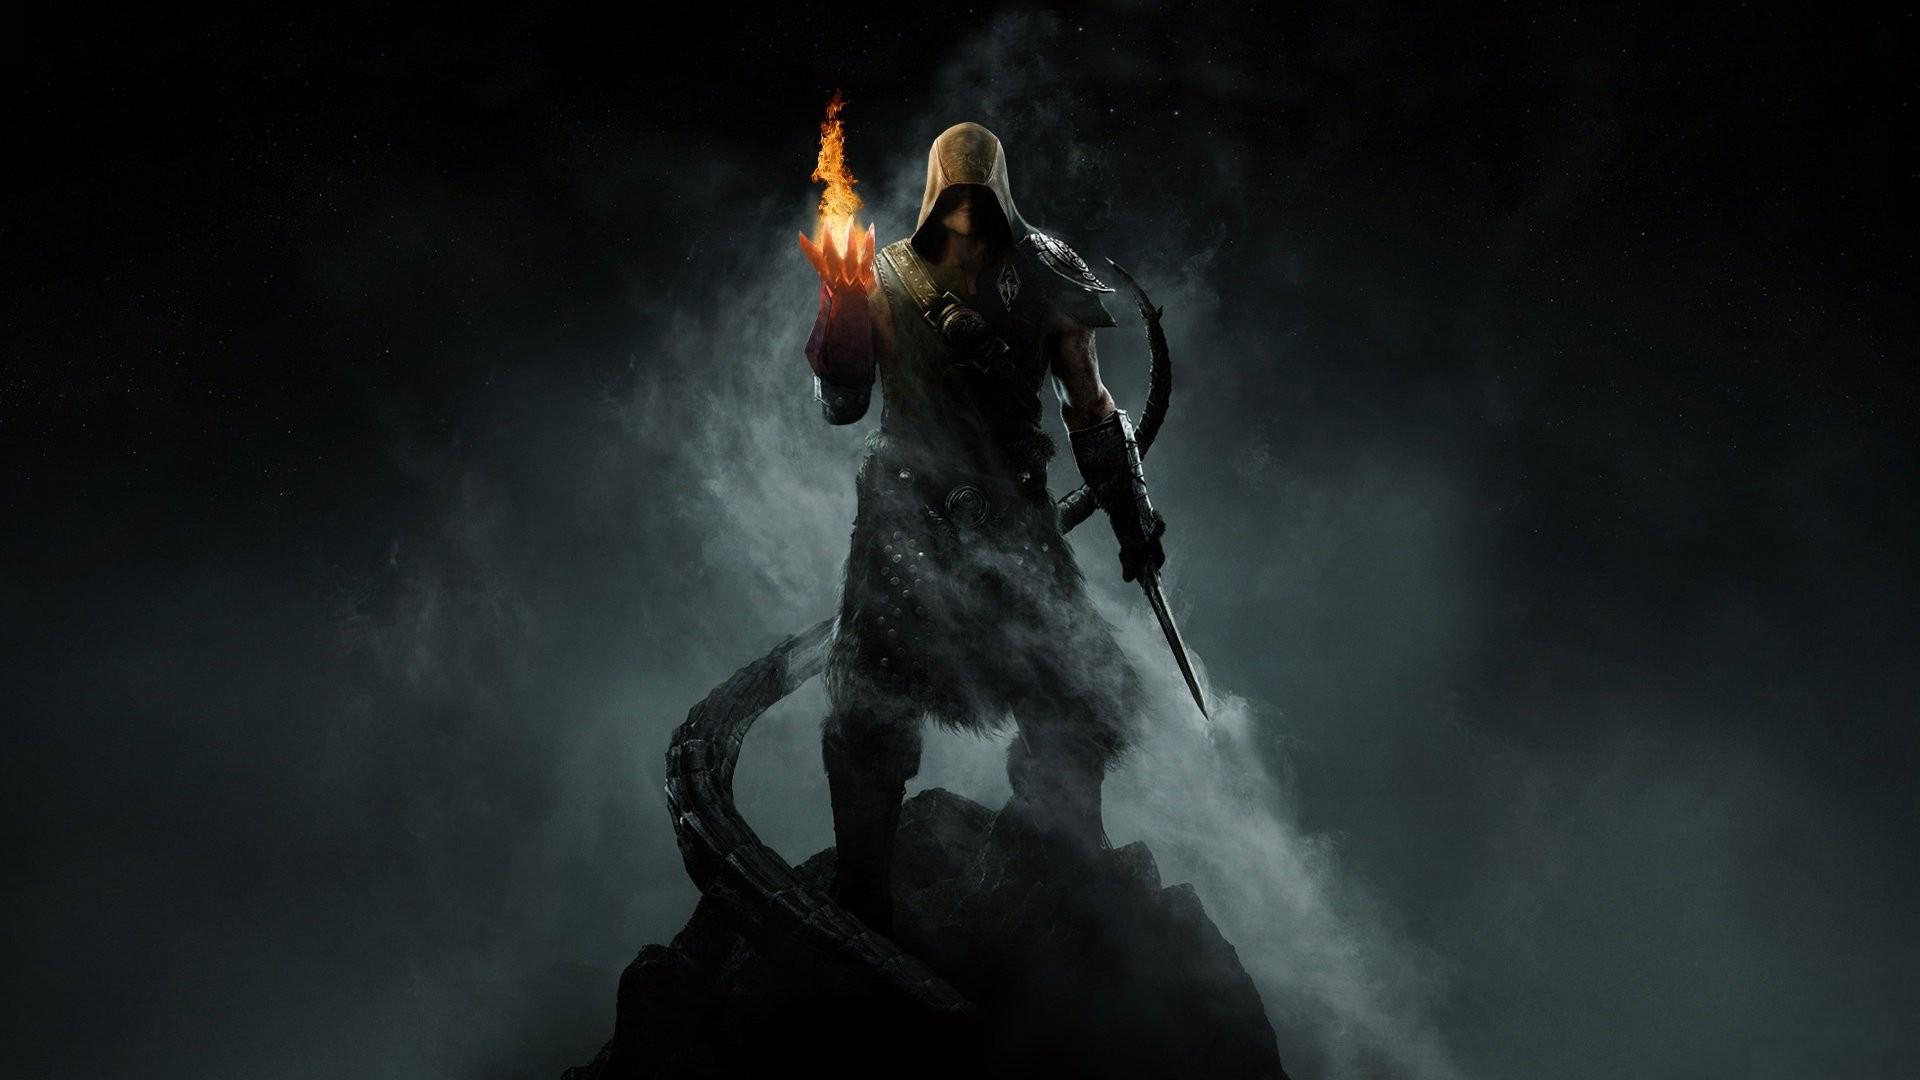 1920x1080 Video Game - The Elder Scrolls V: Skyrim Skyrim Mage Wallpaper